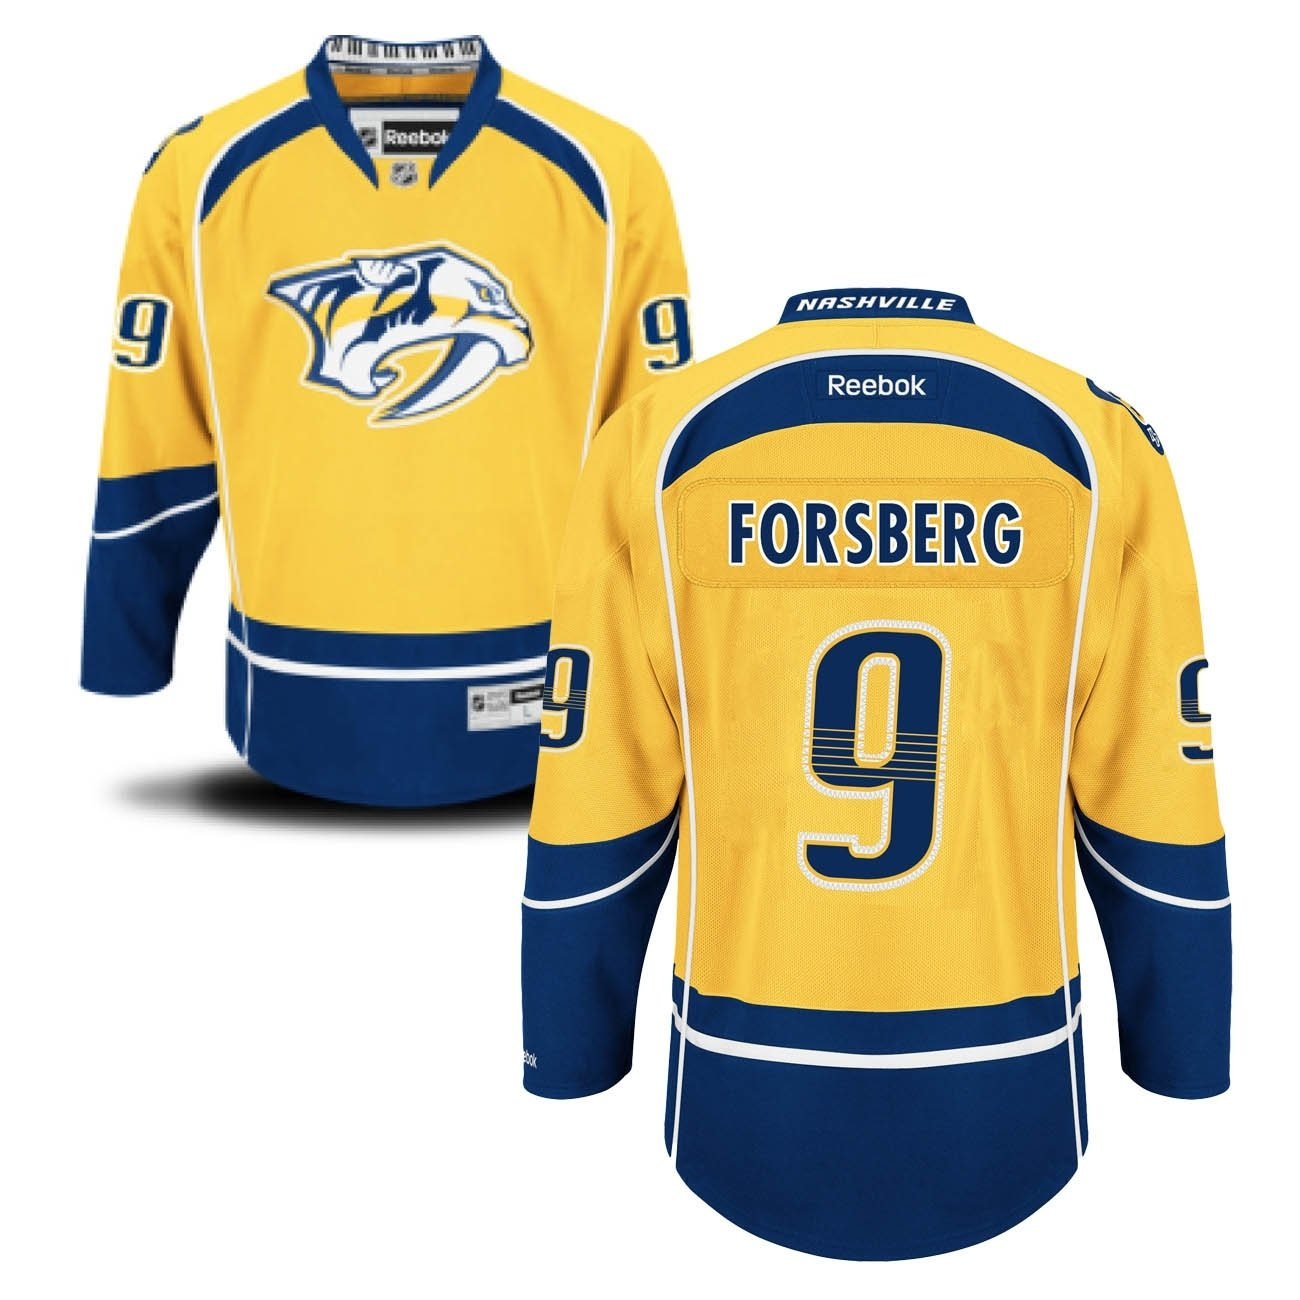 on sale 846f2 648ac Reebok Nashville Predators Filip Forsberg #9 NHL Jersey Home ...